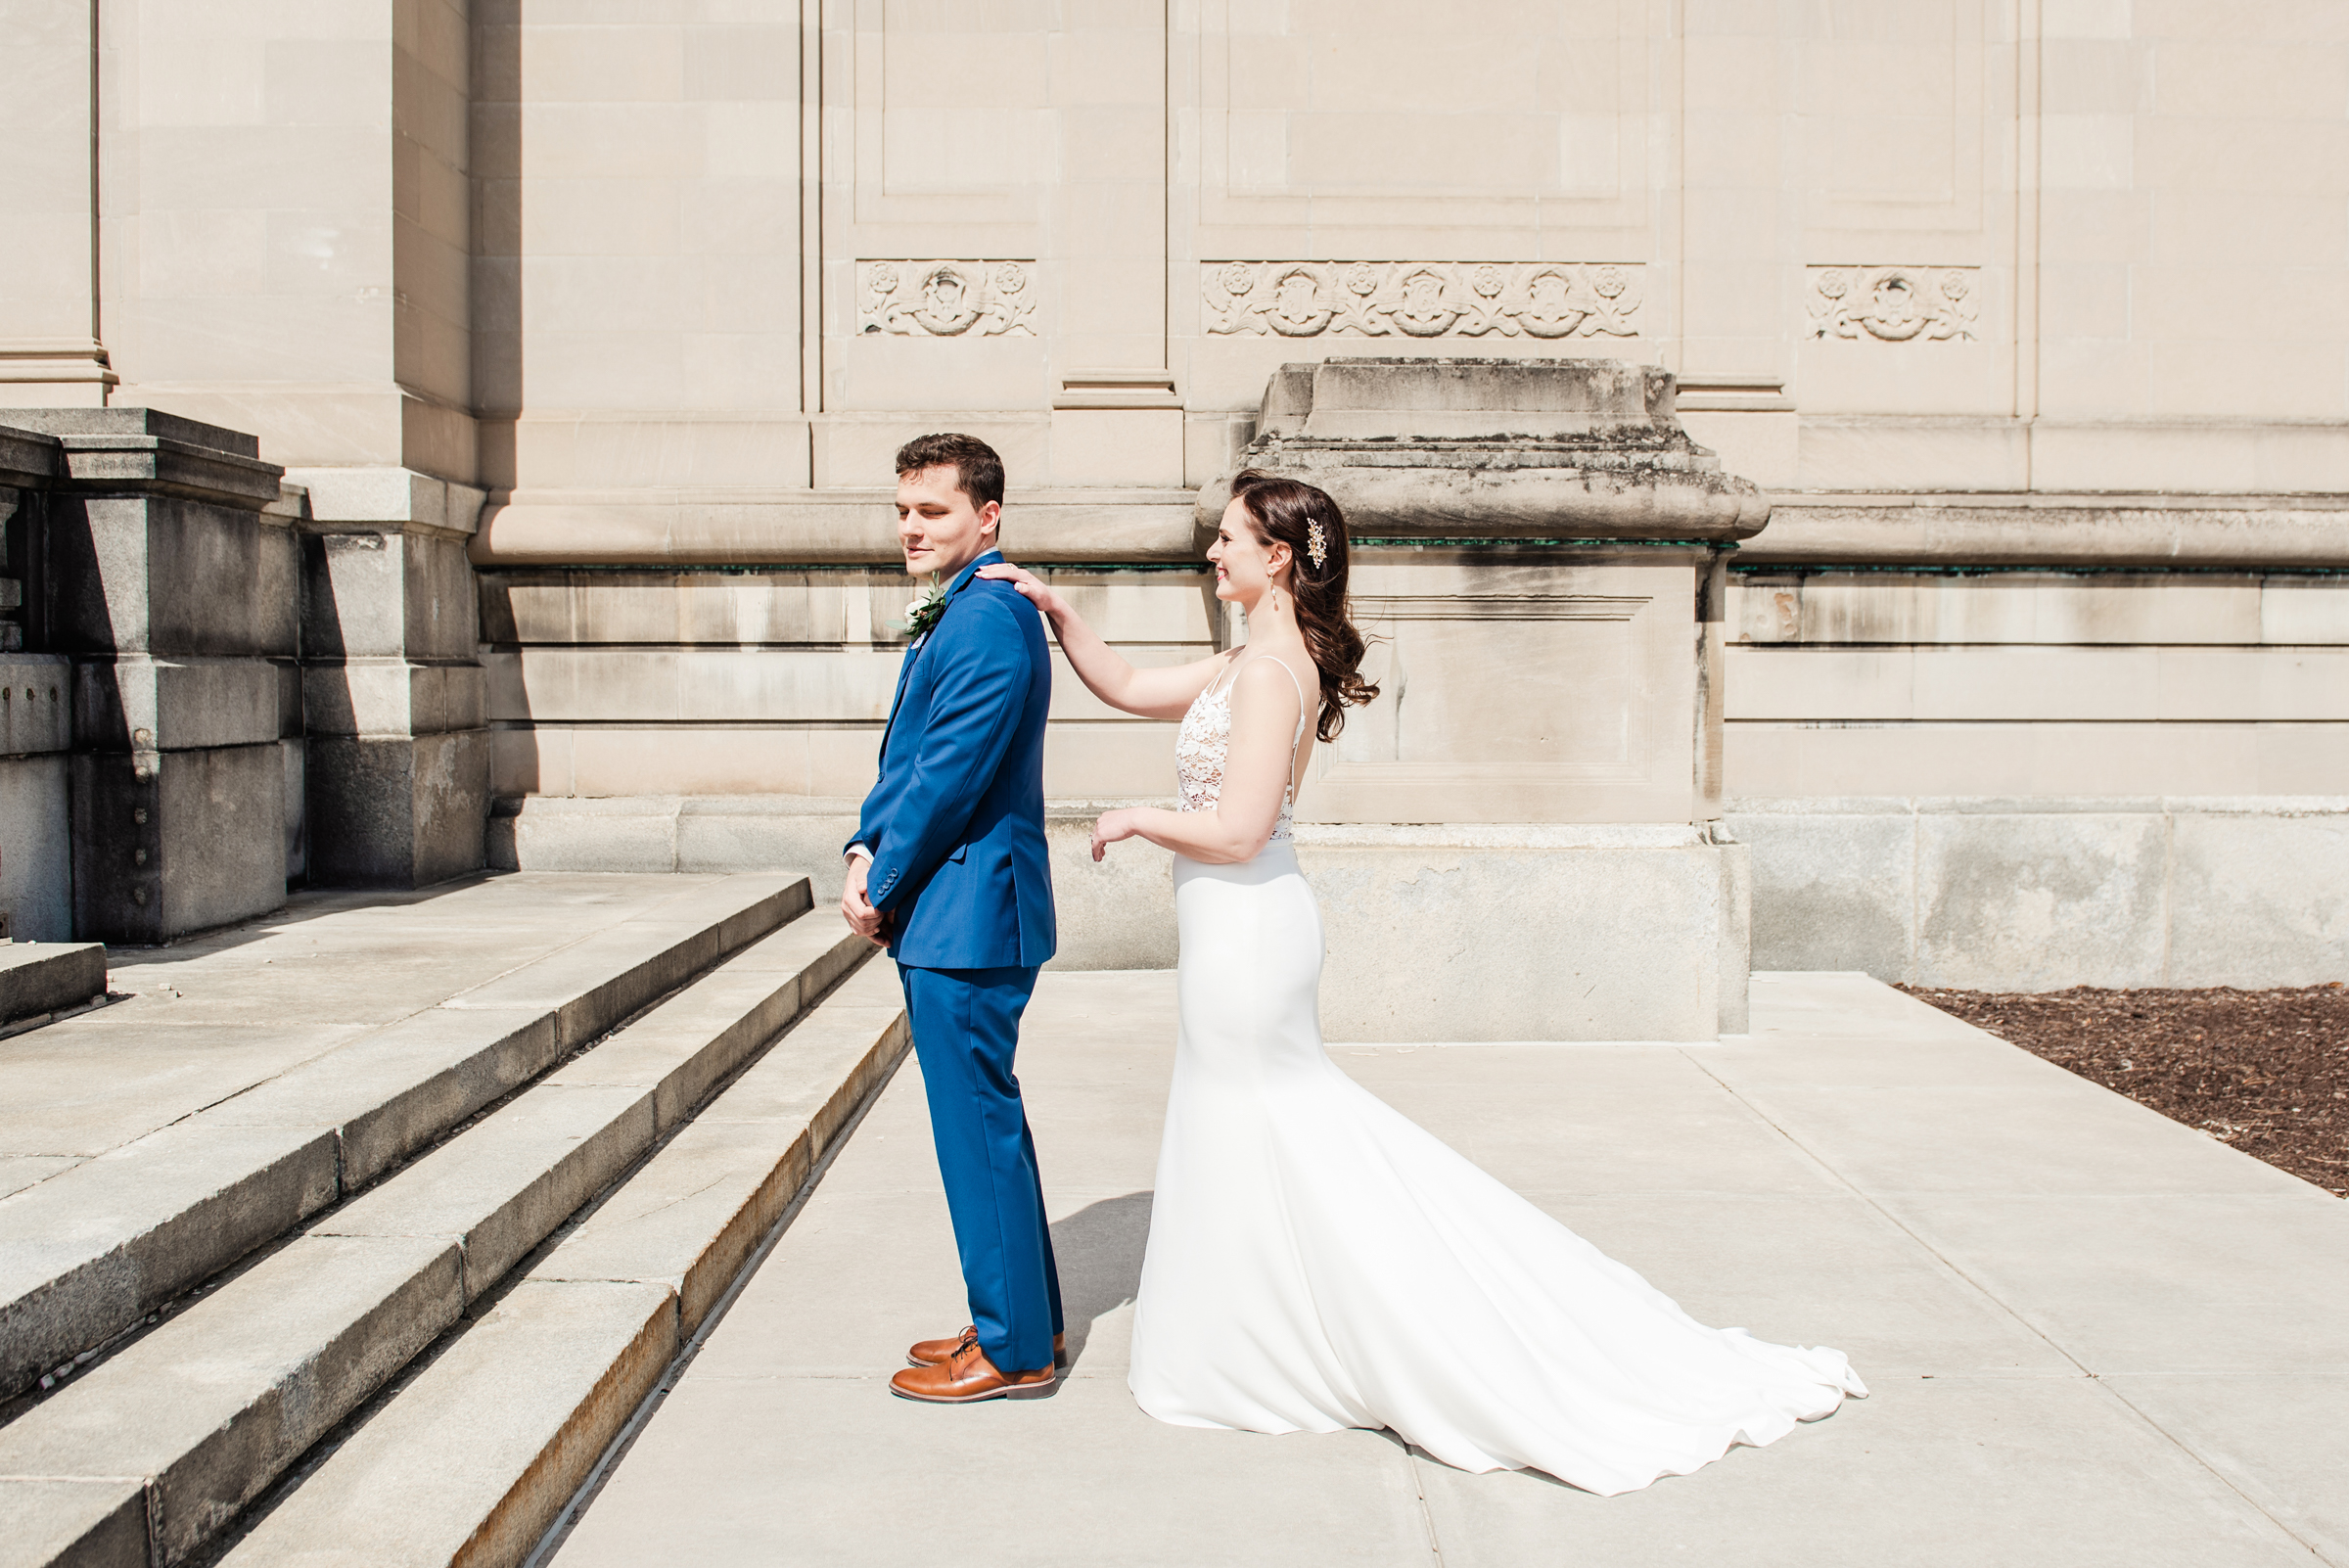 The_Arbor_LoftRochester_Wedding_JILL_STUDIO_Rochester_NY_Photographer_144031.jpg